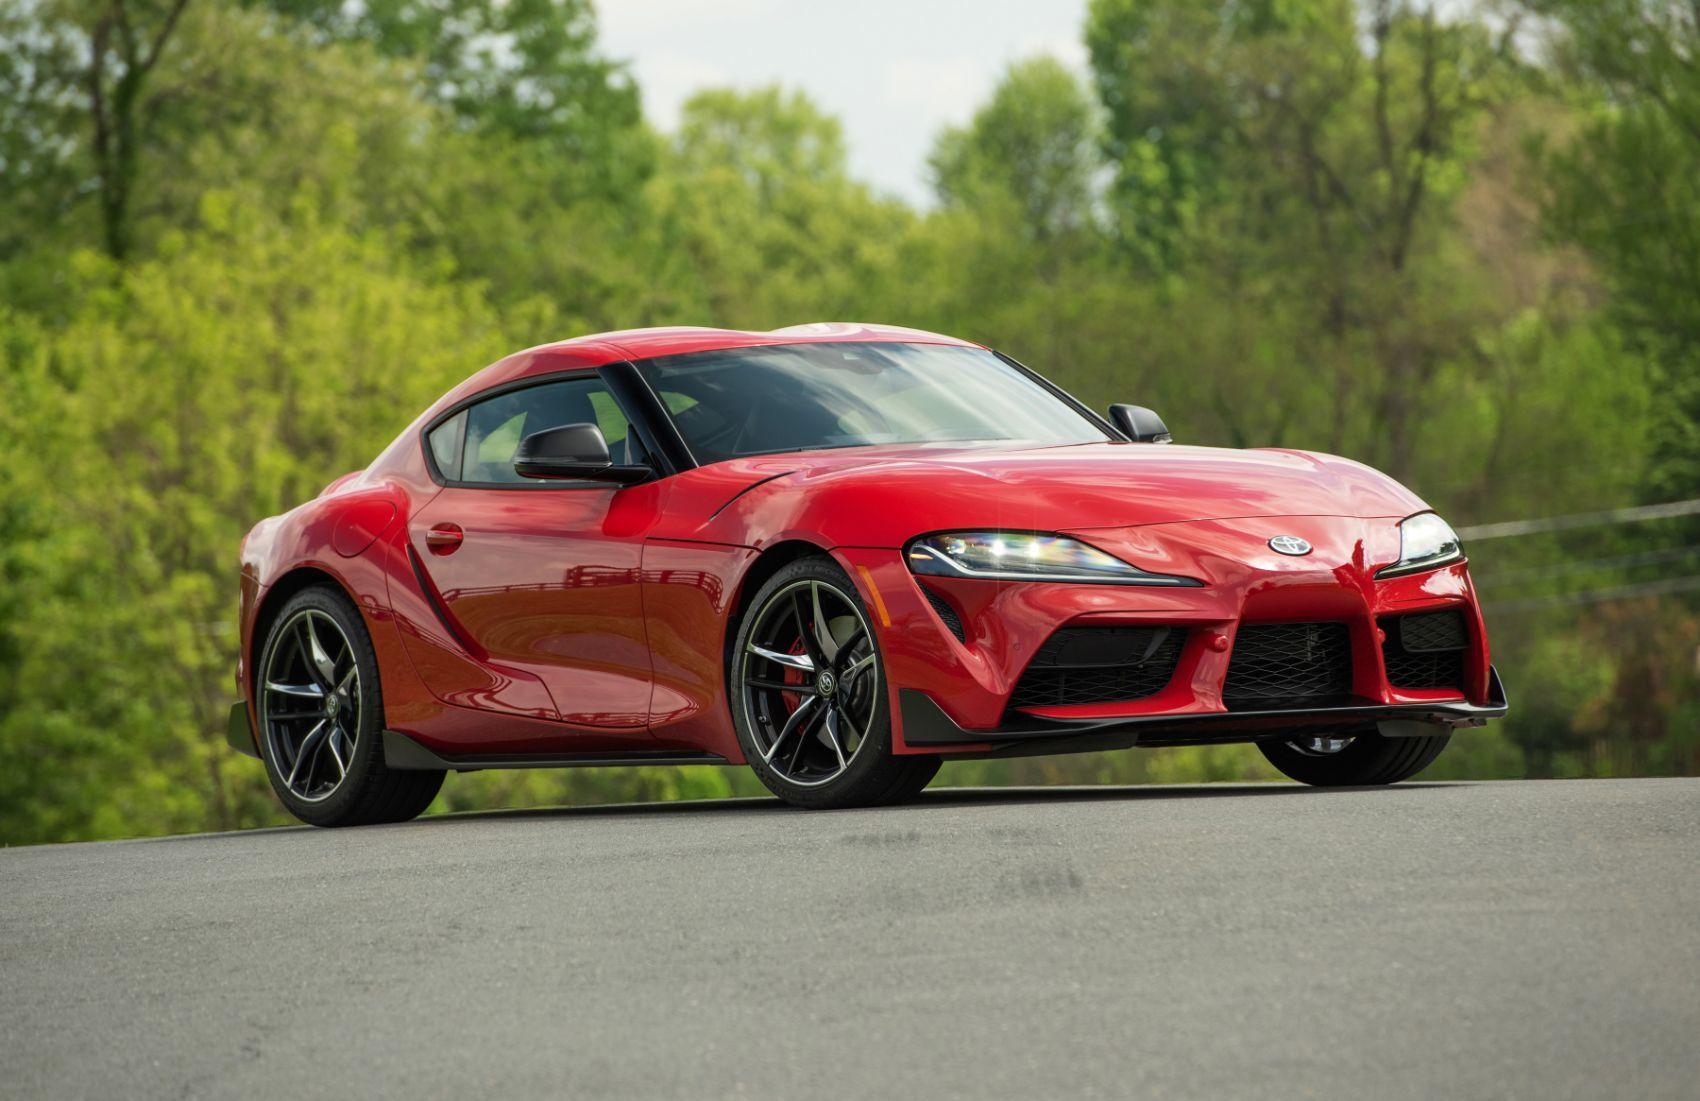 2020 toyota supra: the best toyota sports car?